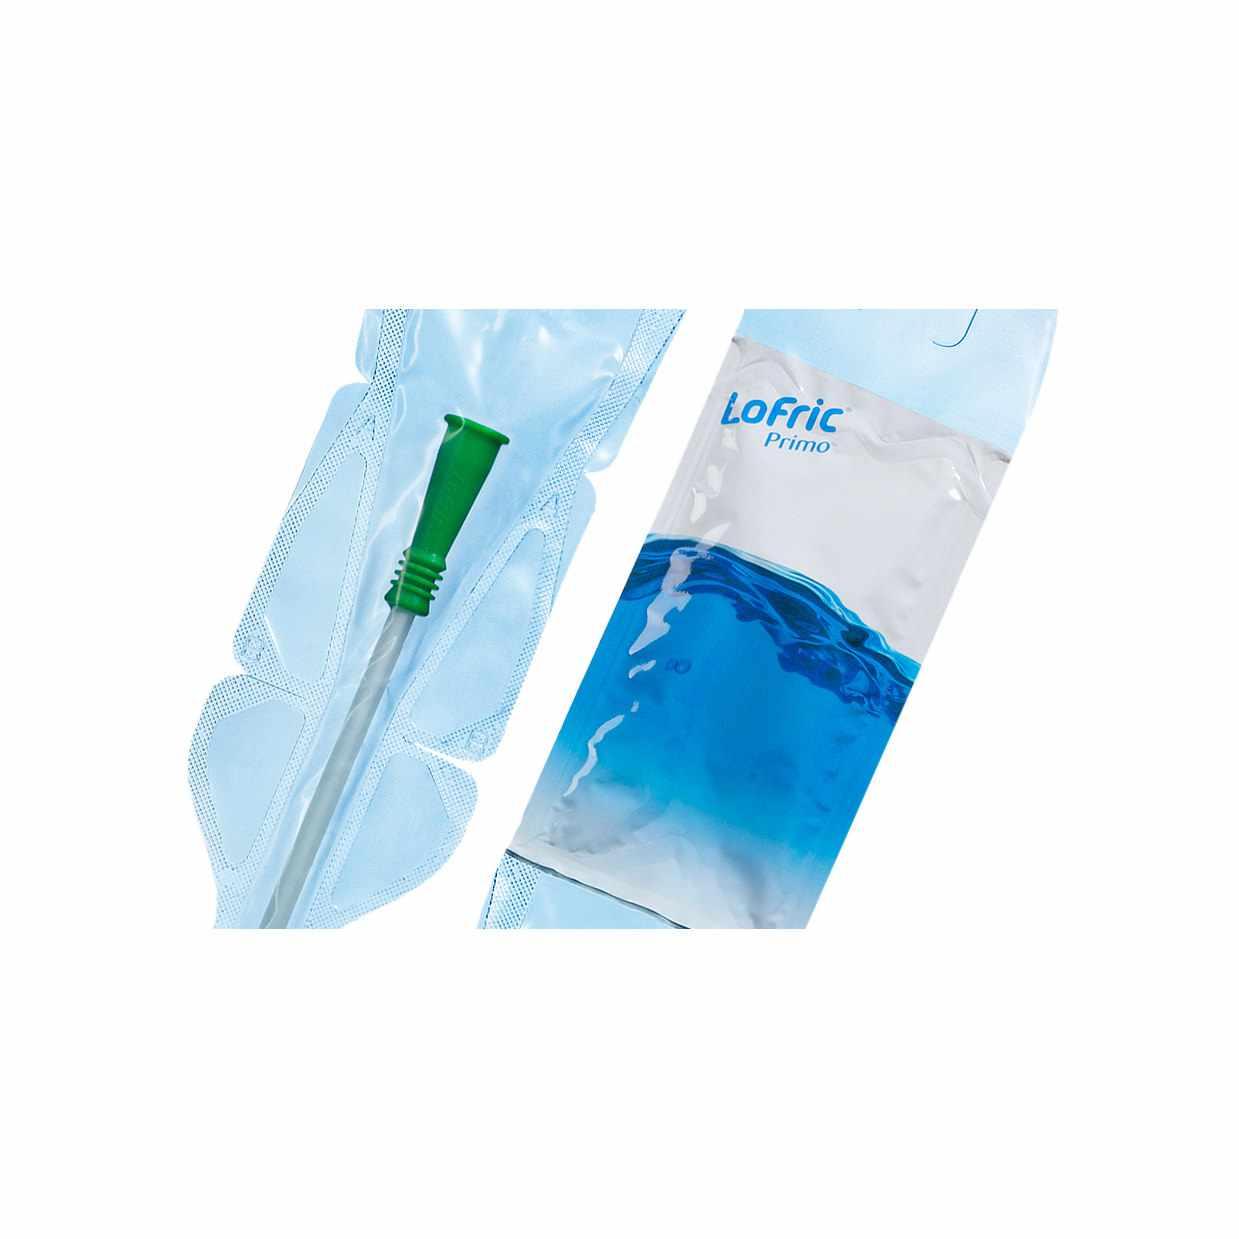 "Wellspect LoFric Primo Hydrophilic Intermittent Catheter, 10Fr 16"" L"